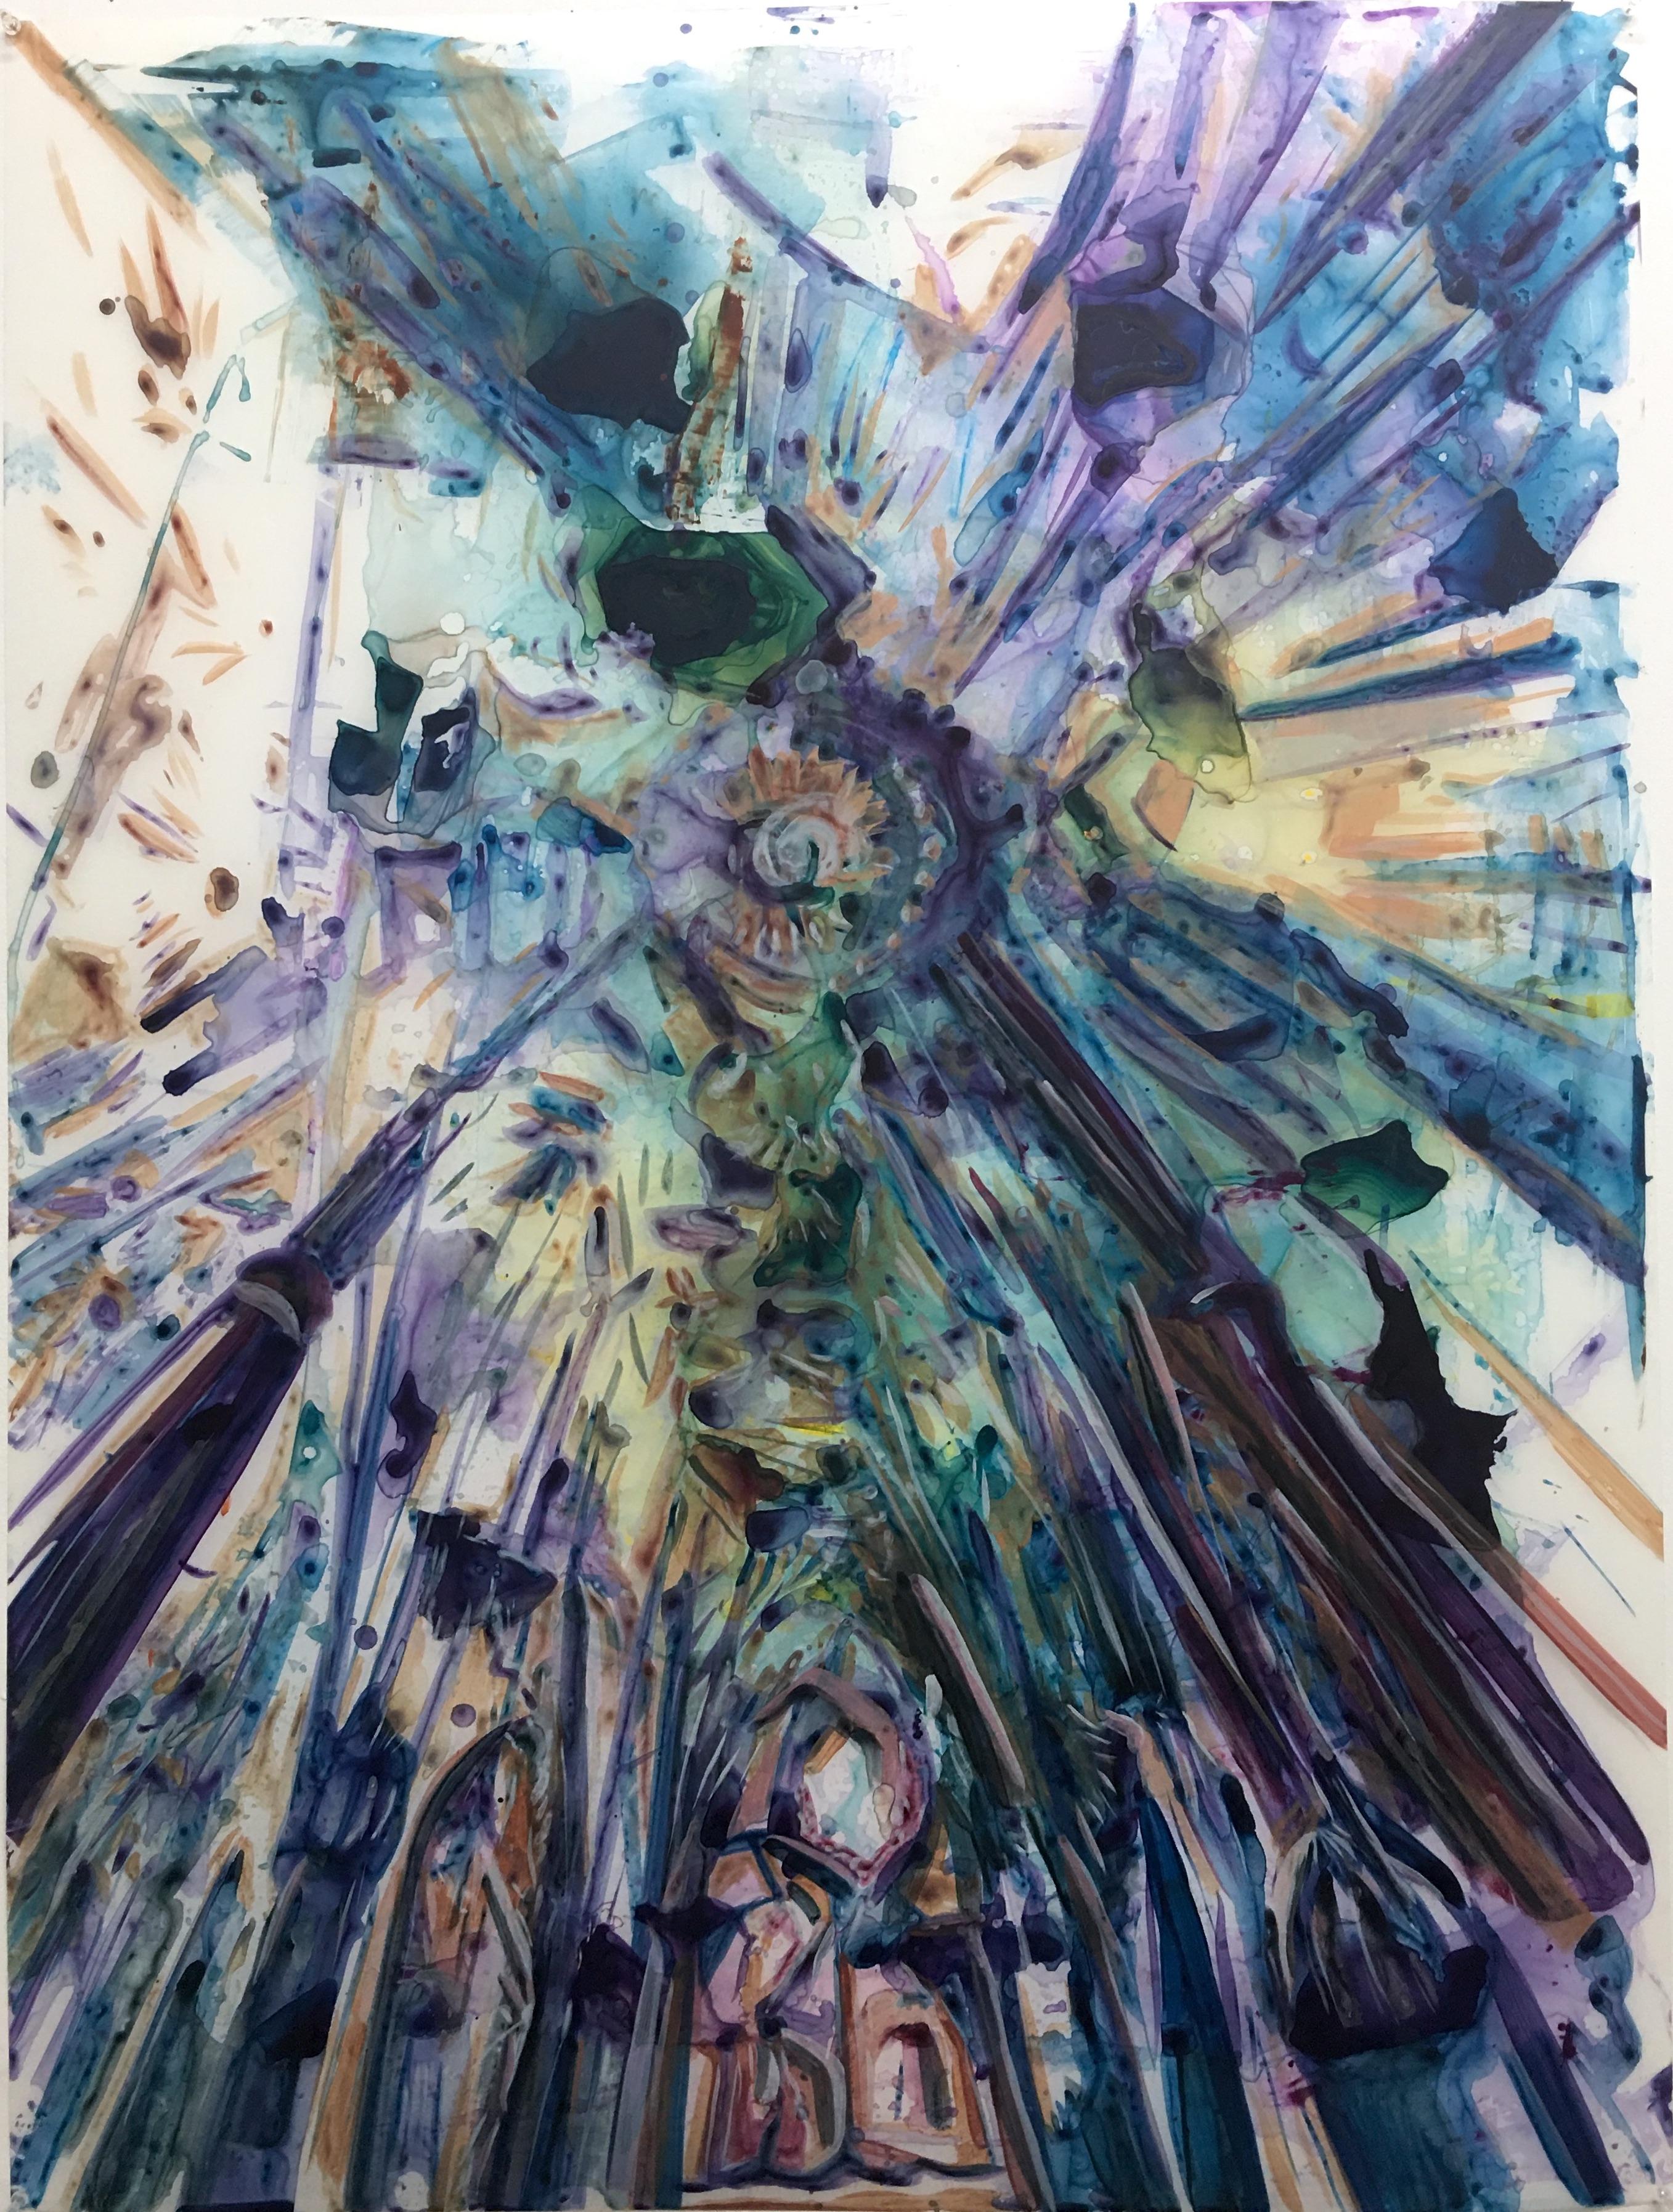 La Sagrada Familia, acrylic on mylar, 48x36 inches, 2020